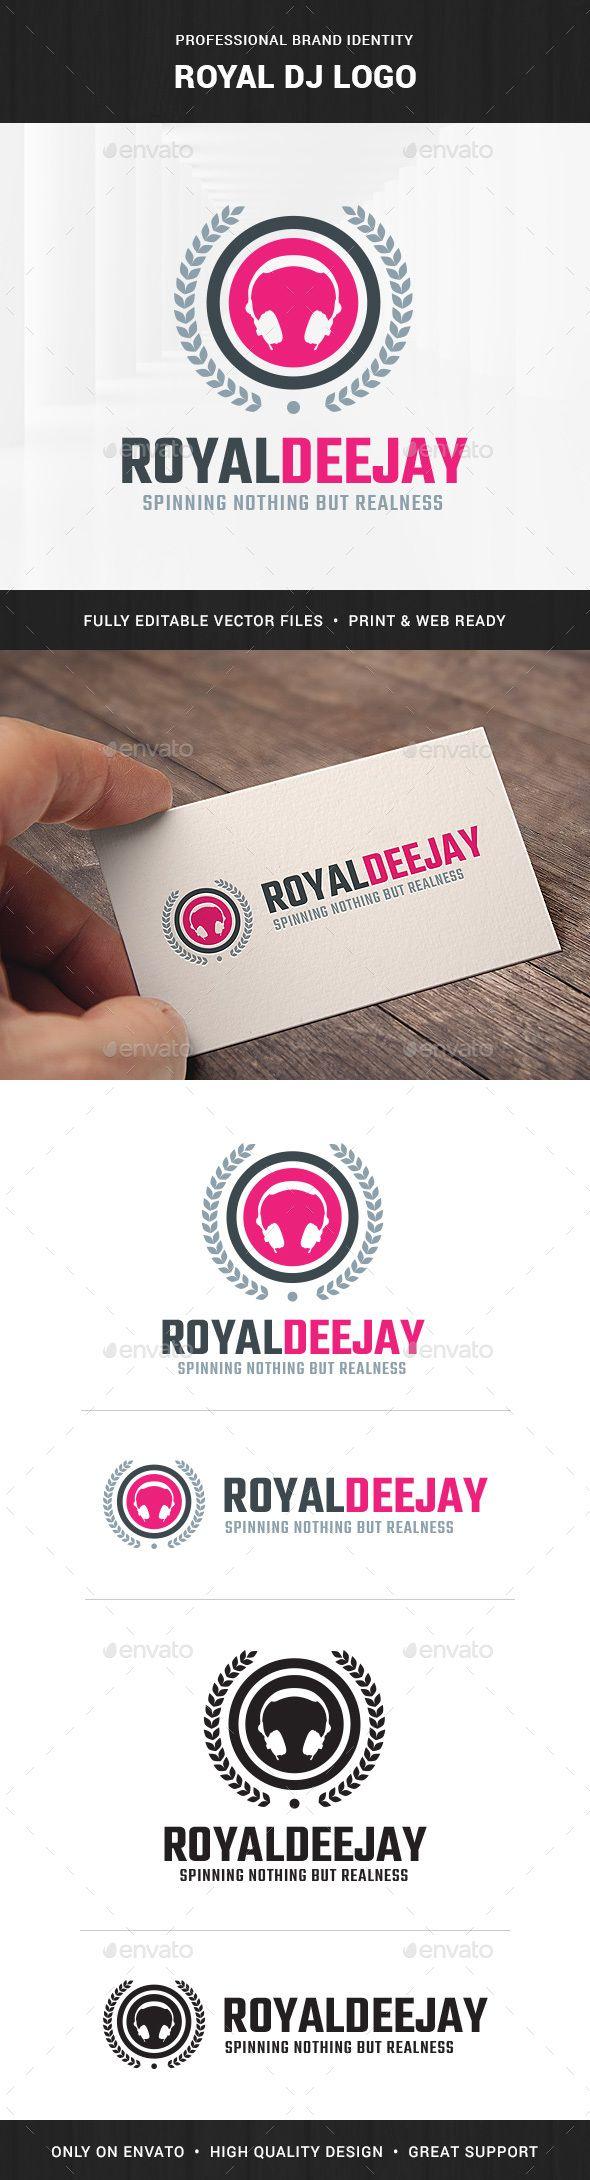 Royal DJ Logo Template v2   Dj logo, Logo templates and Template